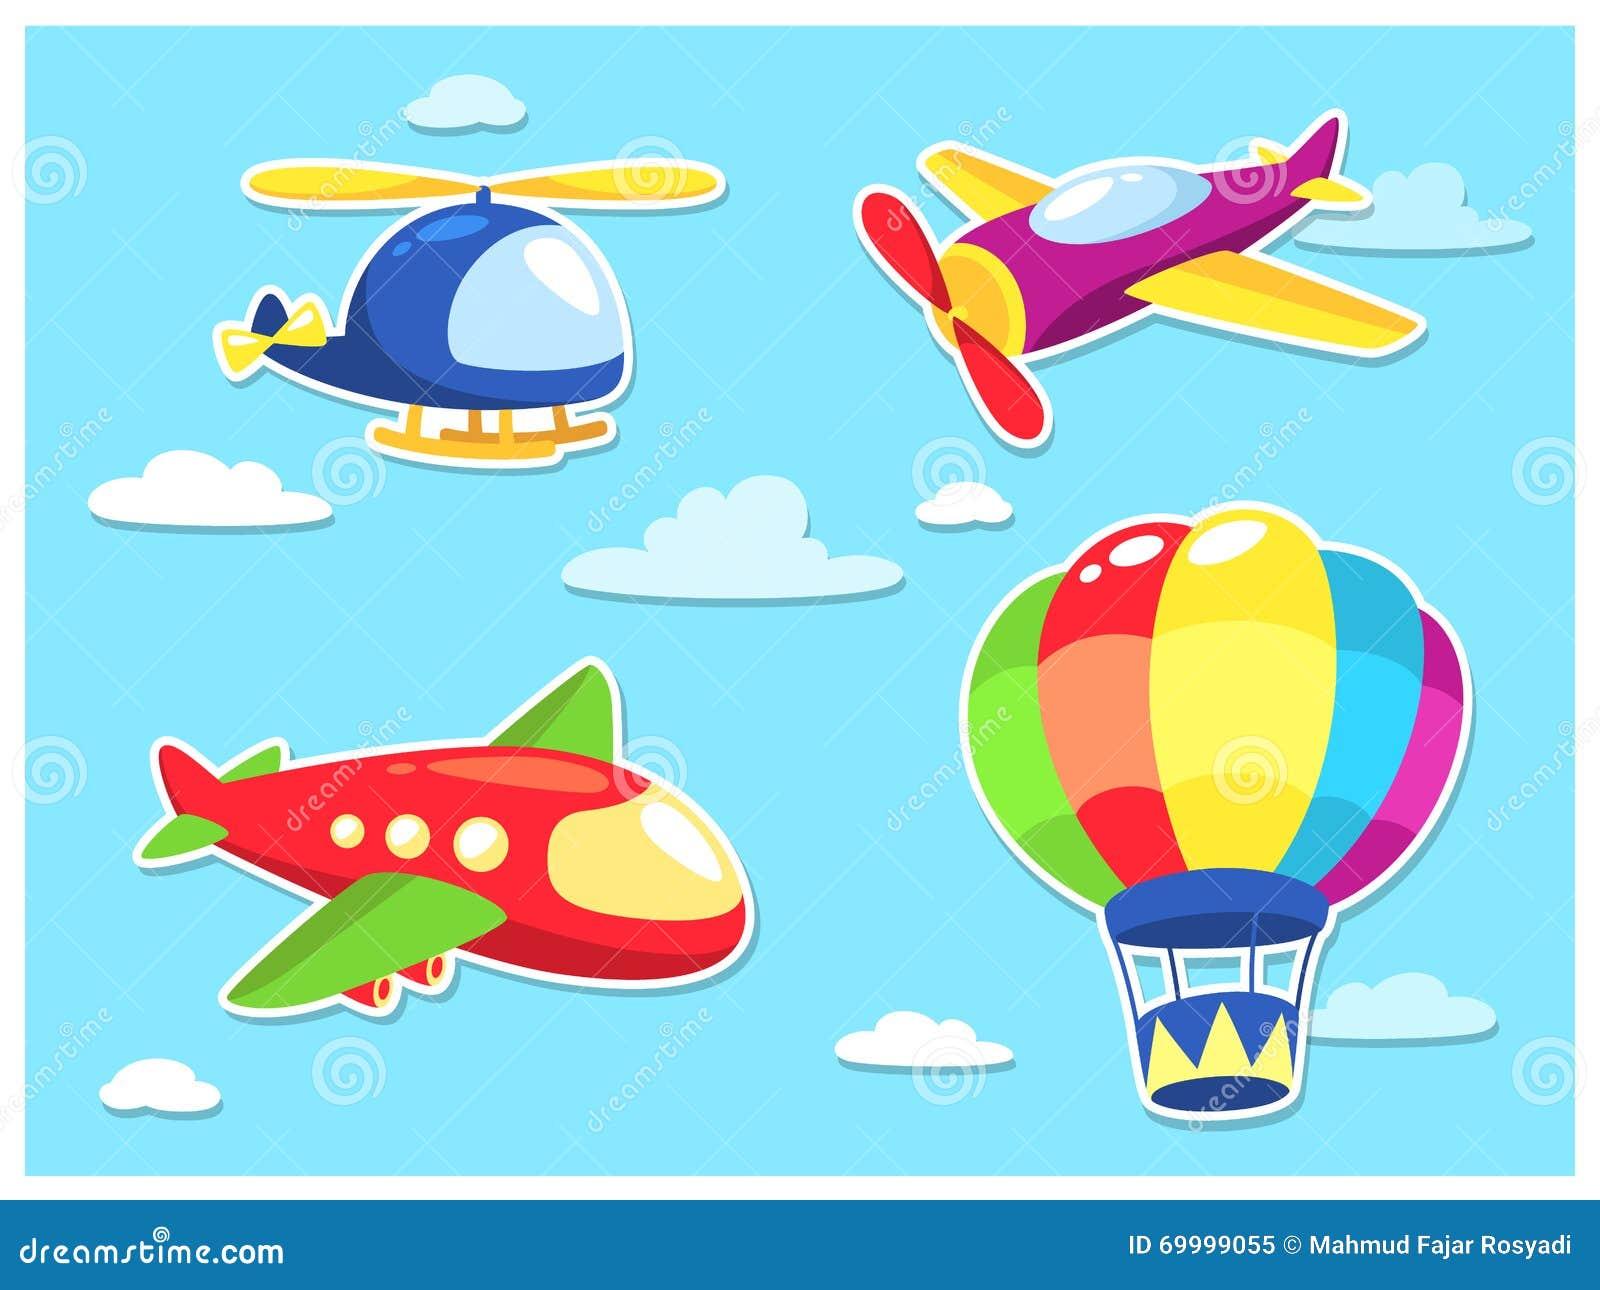 Air Transportation Cartoon Stock Vector Image 69999055